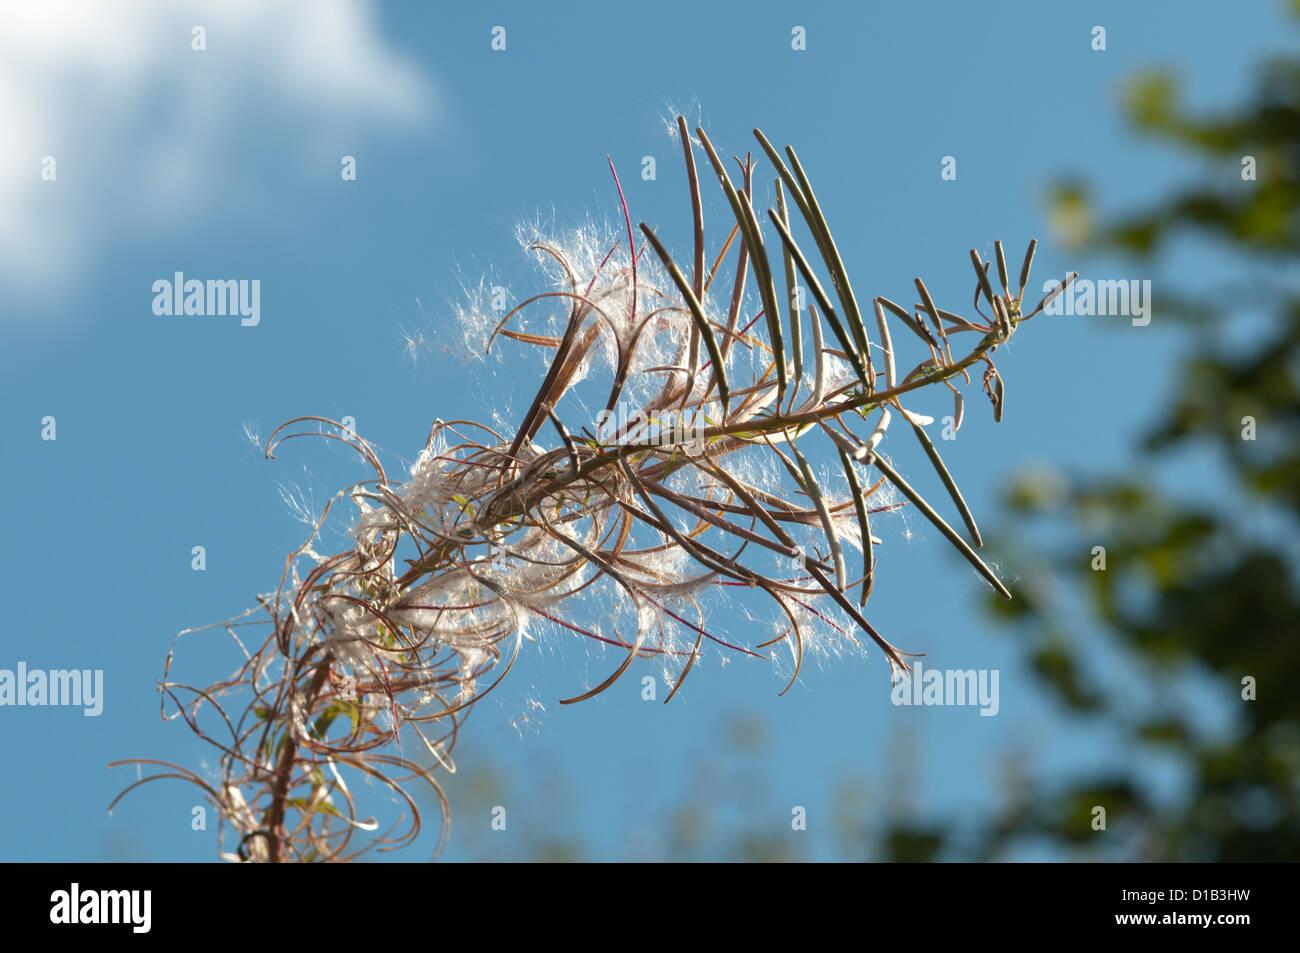 Rosebay willowherb [Chamerion angustifolium] seedhead. West Sussex, UK. September. - Stock Image